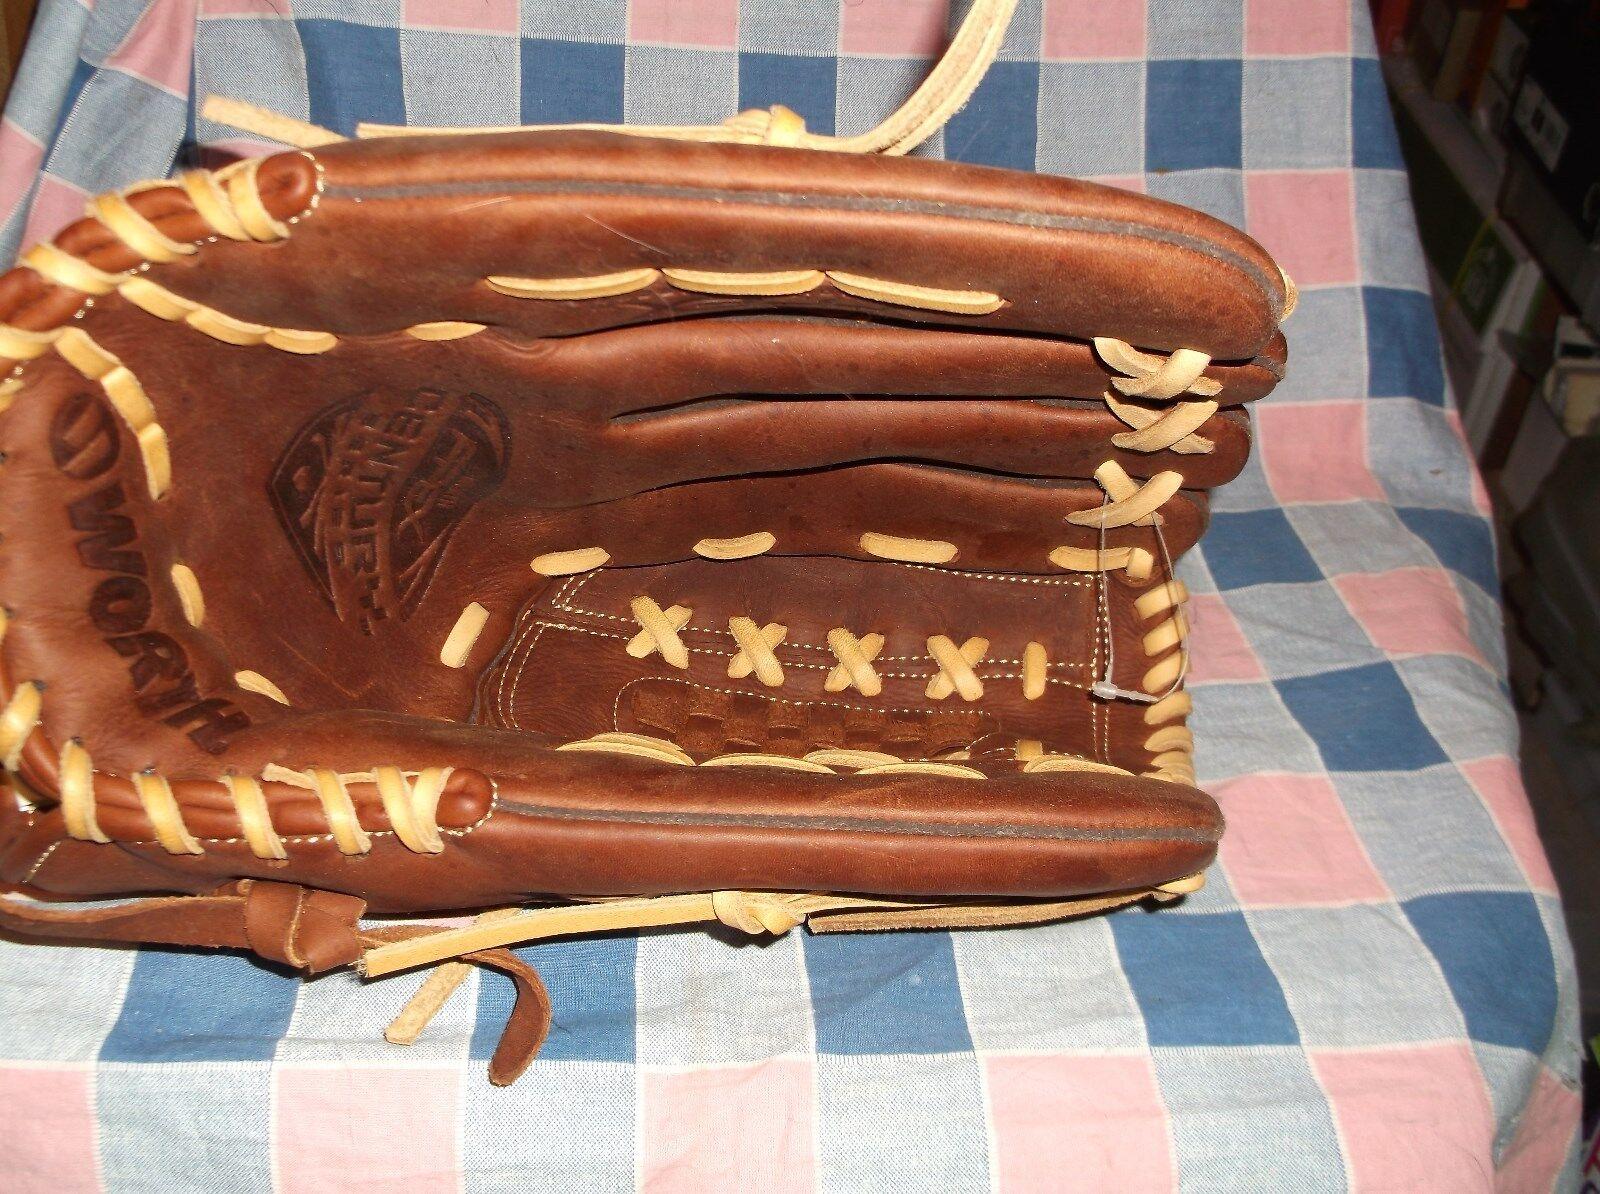 Appears New Worth Apex Century Series Fastpitch Softball Glove C130X 13